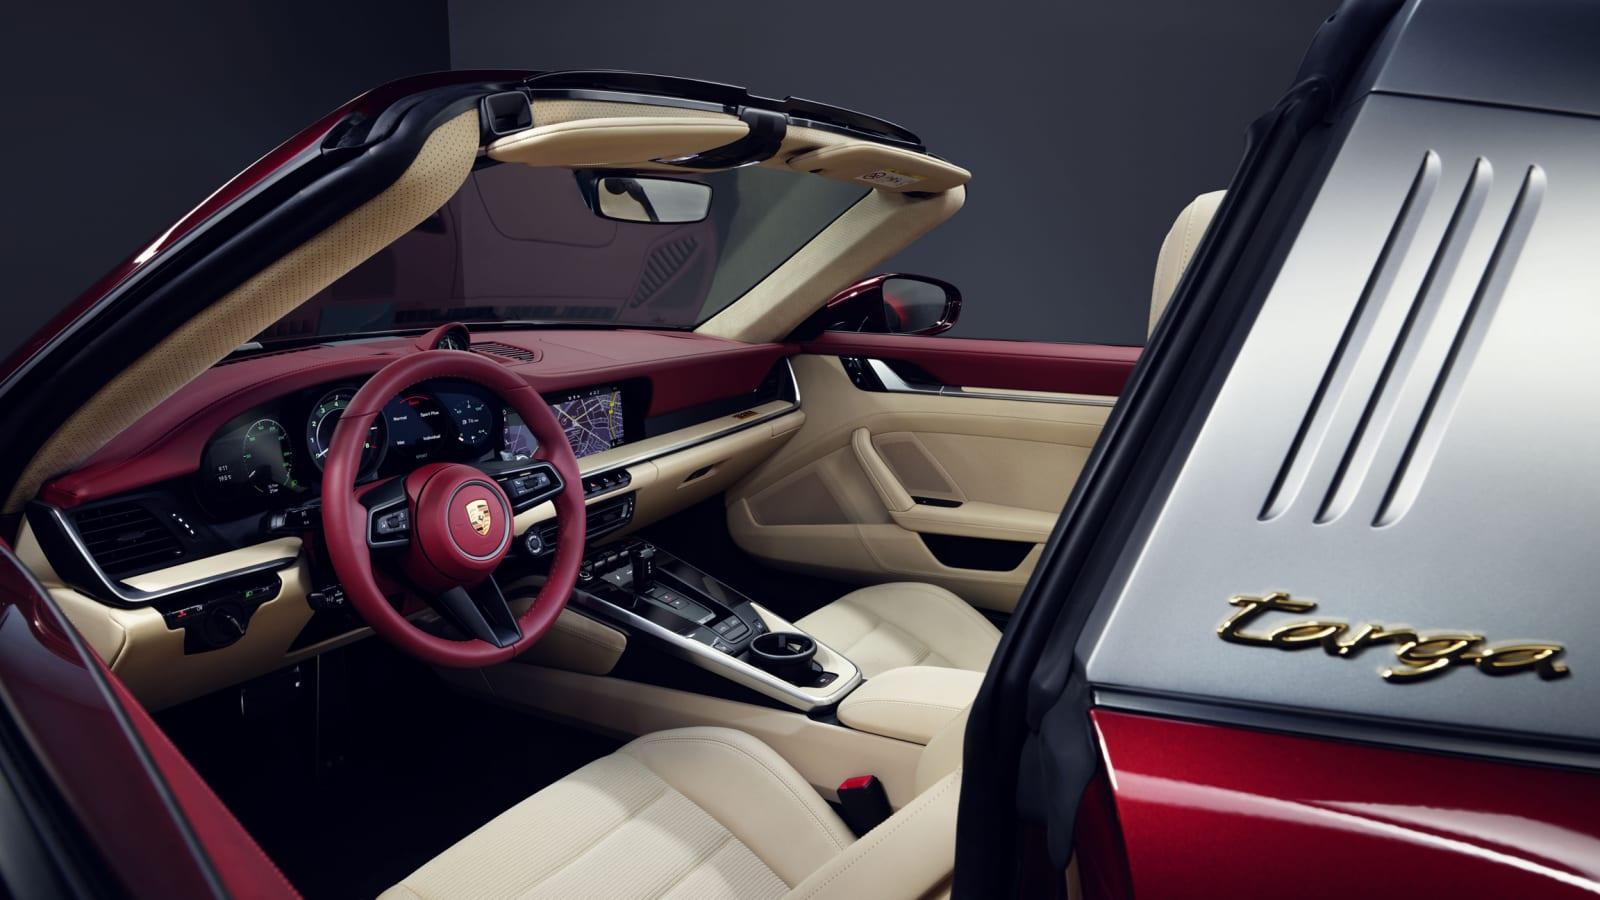 2021 Porsche 911 Targa 4S Heritage Design Edition introduced